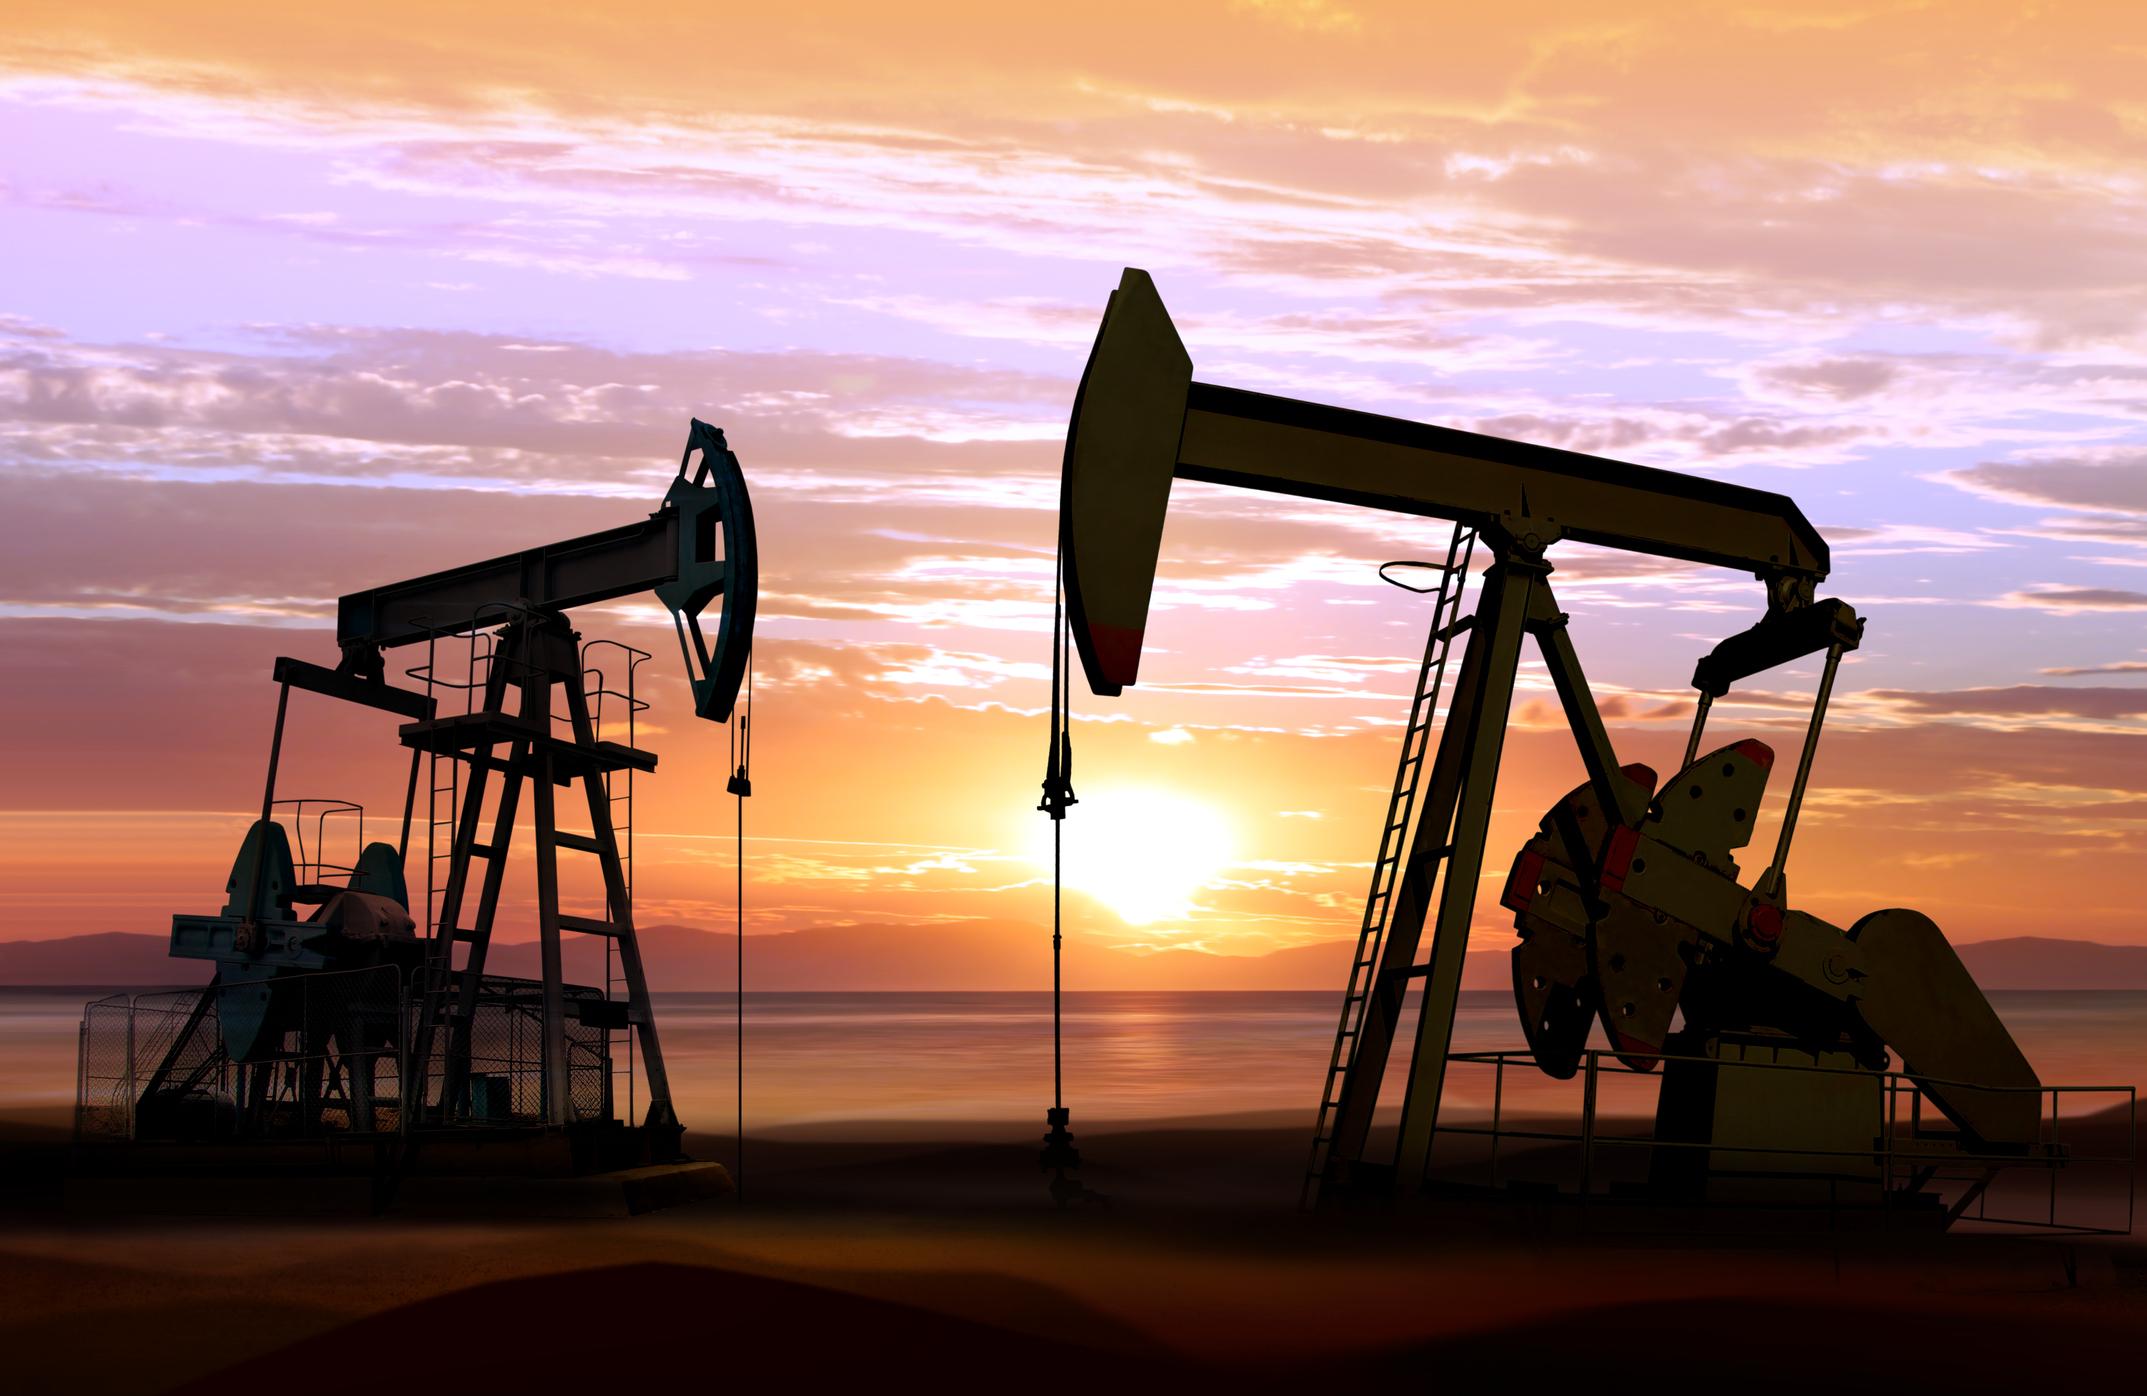 Oil pumpjacks operating at sunset.